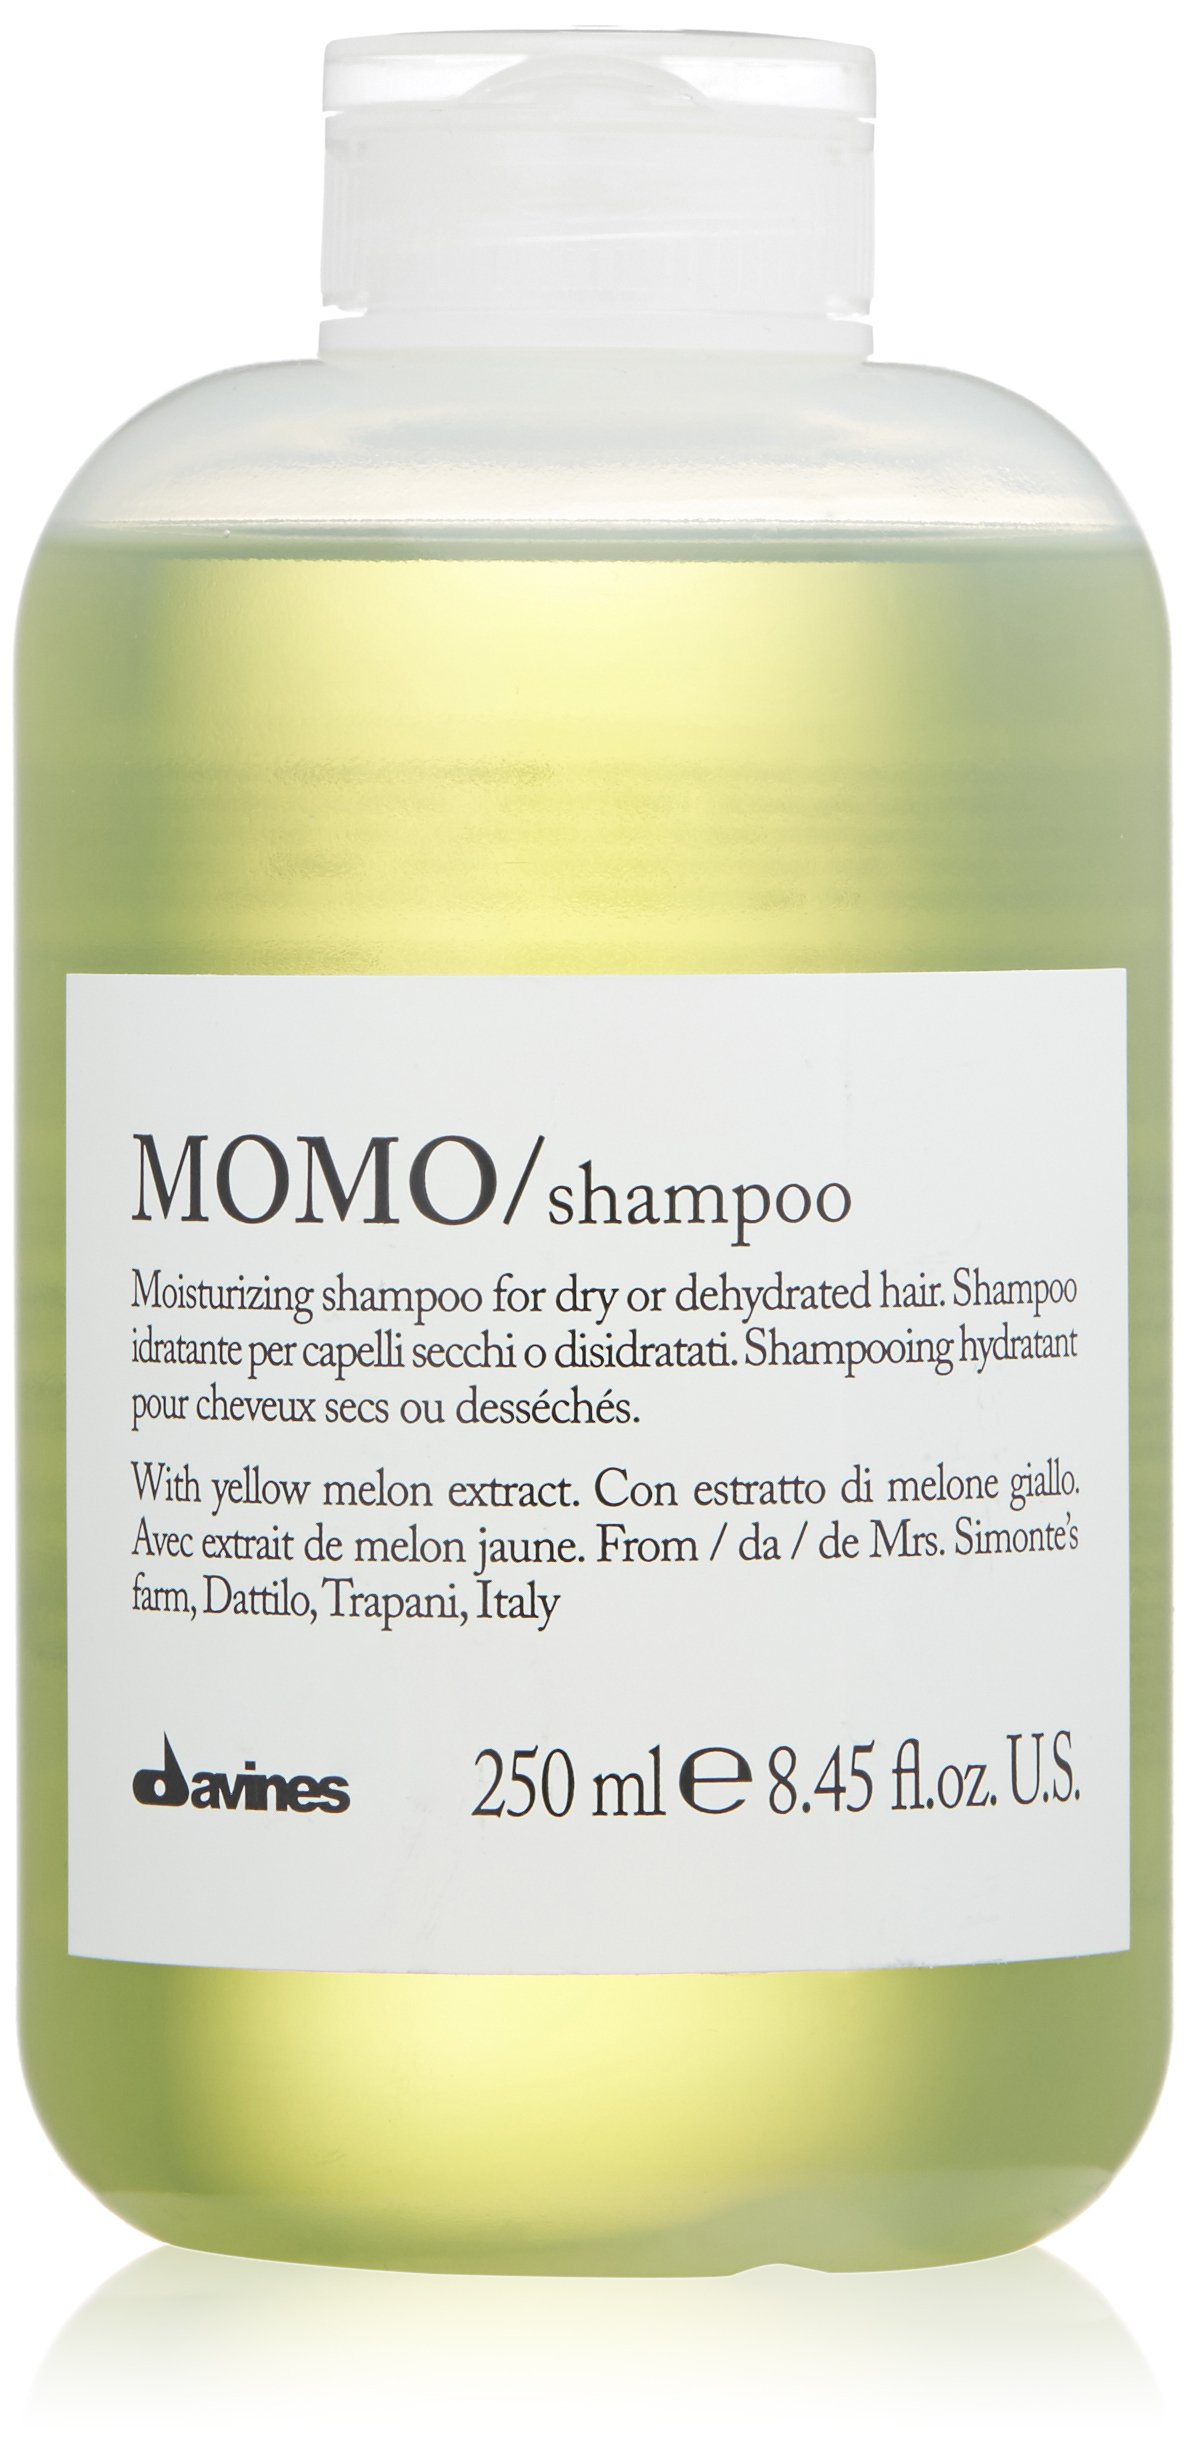 davines shampoo recension